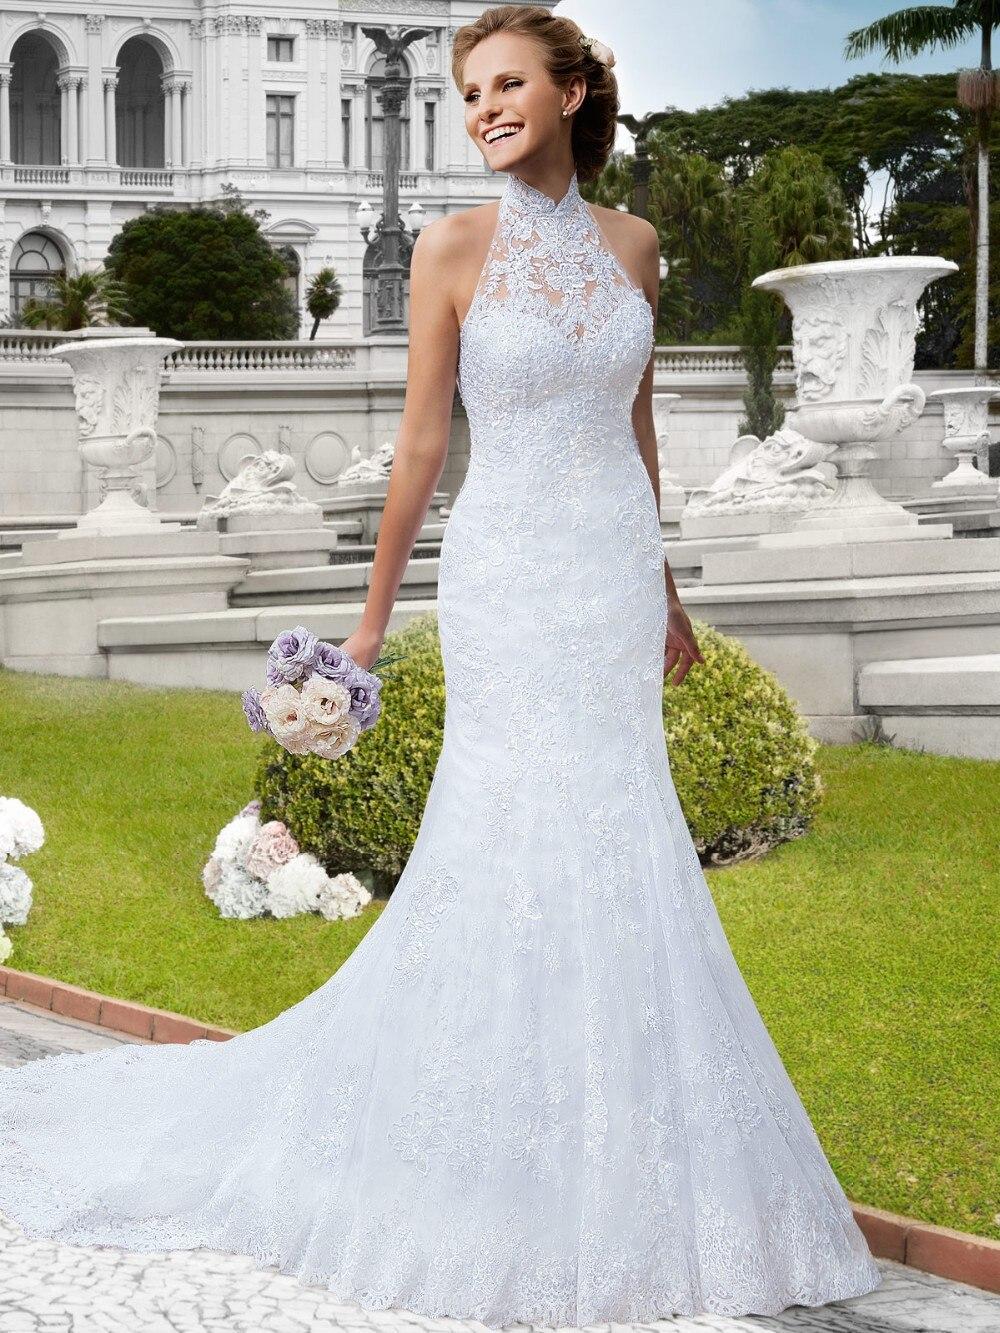 2017 Noble Lace Mermaid Wedding Dresses High Collar Bridal Dresses ...